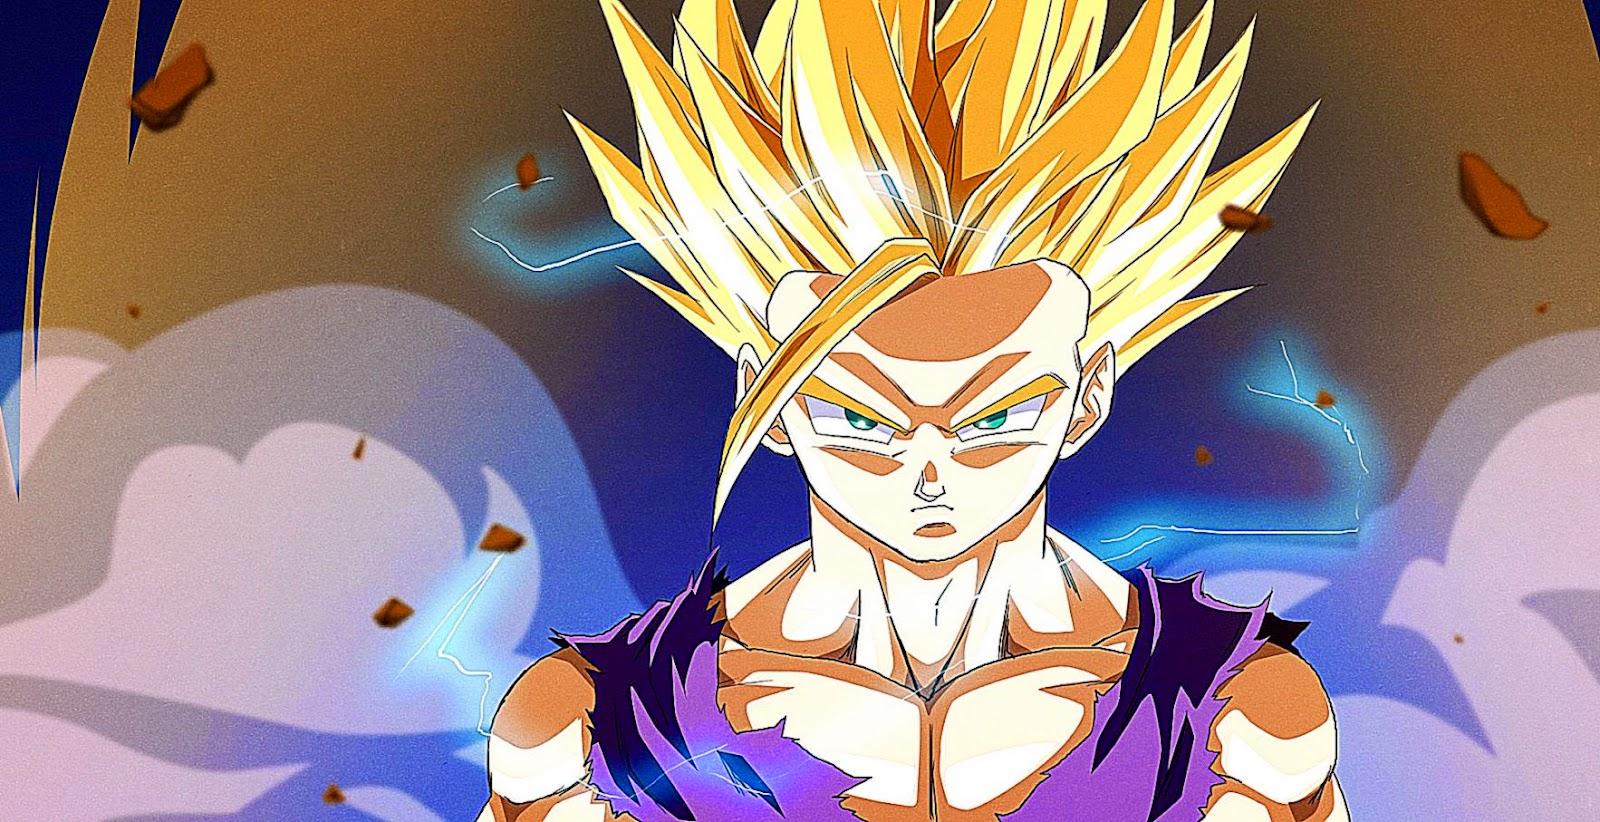 Dragon Ball Z Wallpaper Super Saiyans: Goku Super Saiyan Hd Wallpapers